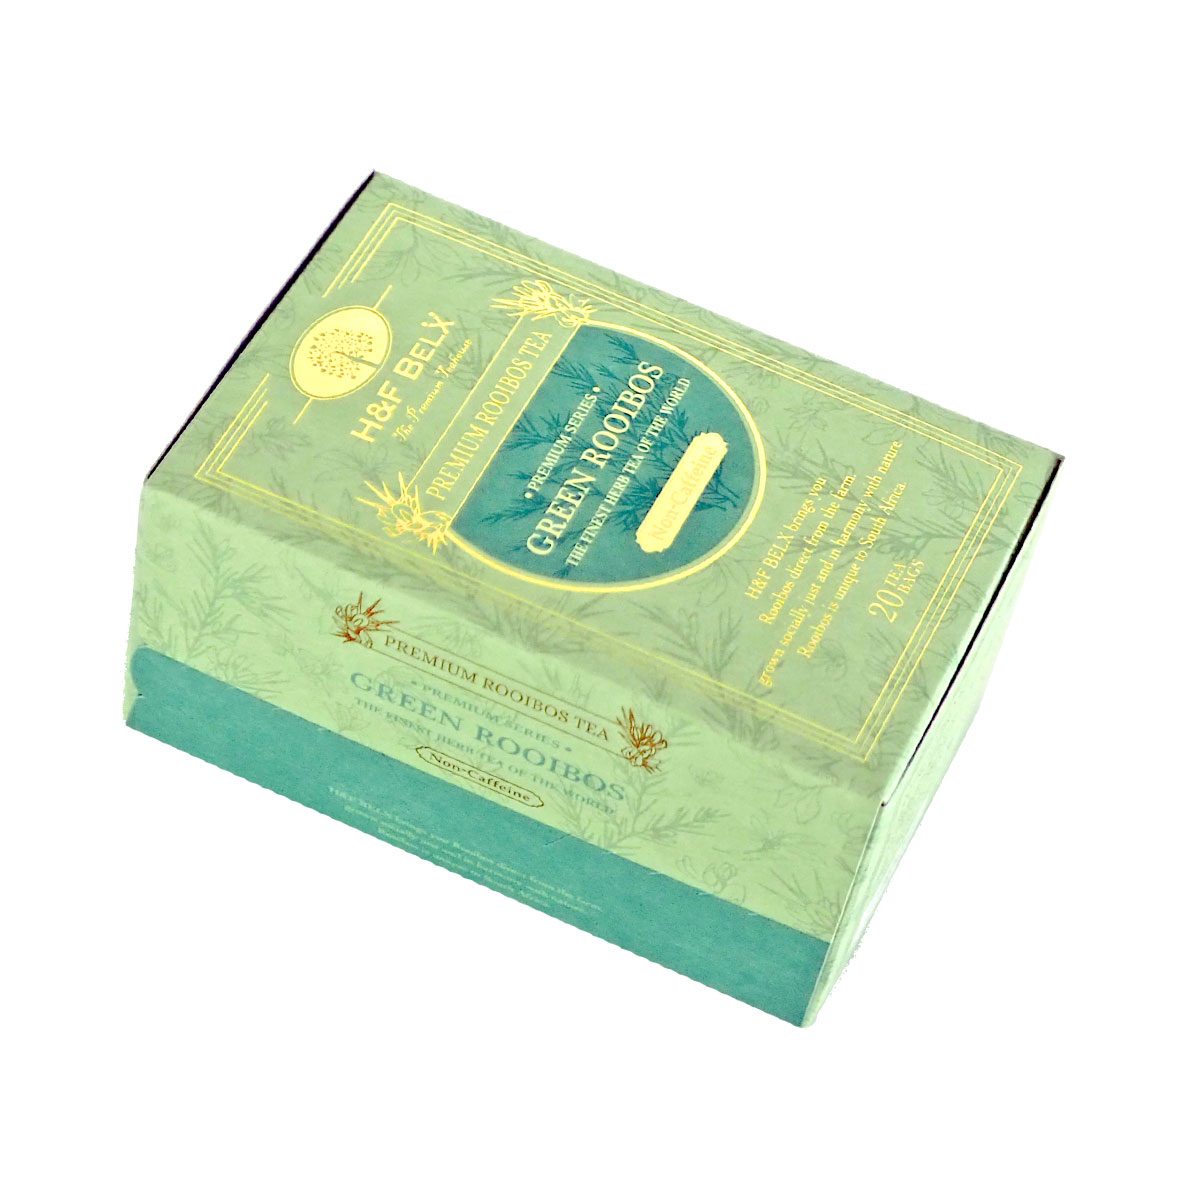 20TB タグ付き 個包装 お中元 20包 グリーンルイボスティー 1.5g×20TBルイボスティー ルイボス茶 未発酵 グリーン フレーバーティー ハーブティー 驚きの値段で お茶 茶葉 ベルクス プレミアム BELX ピュア アップル ティーバッグ HF ノンカフェイン エイチアンドエフ